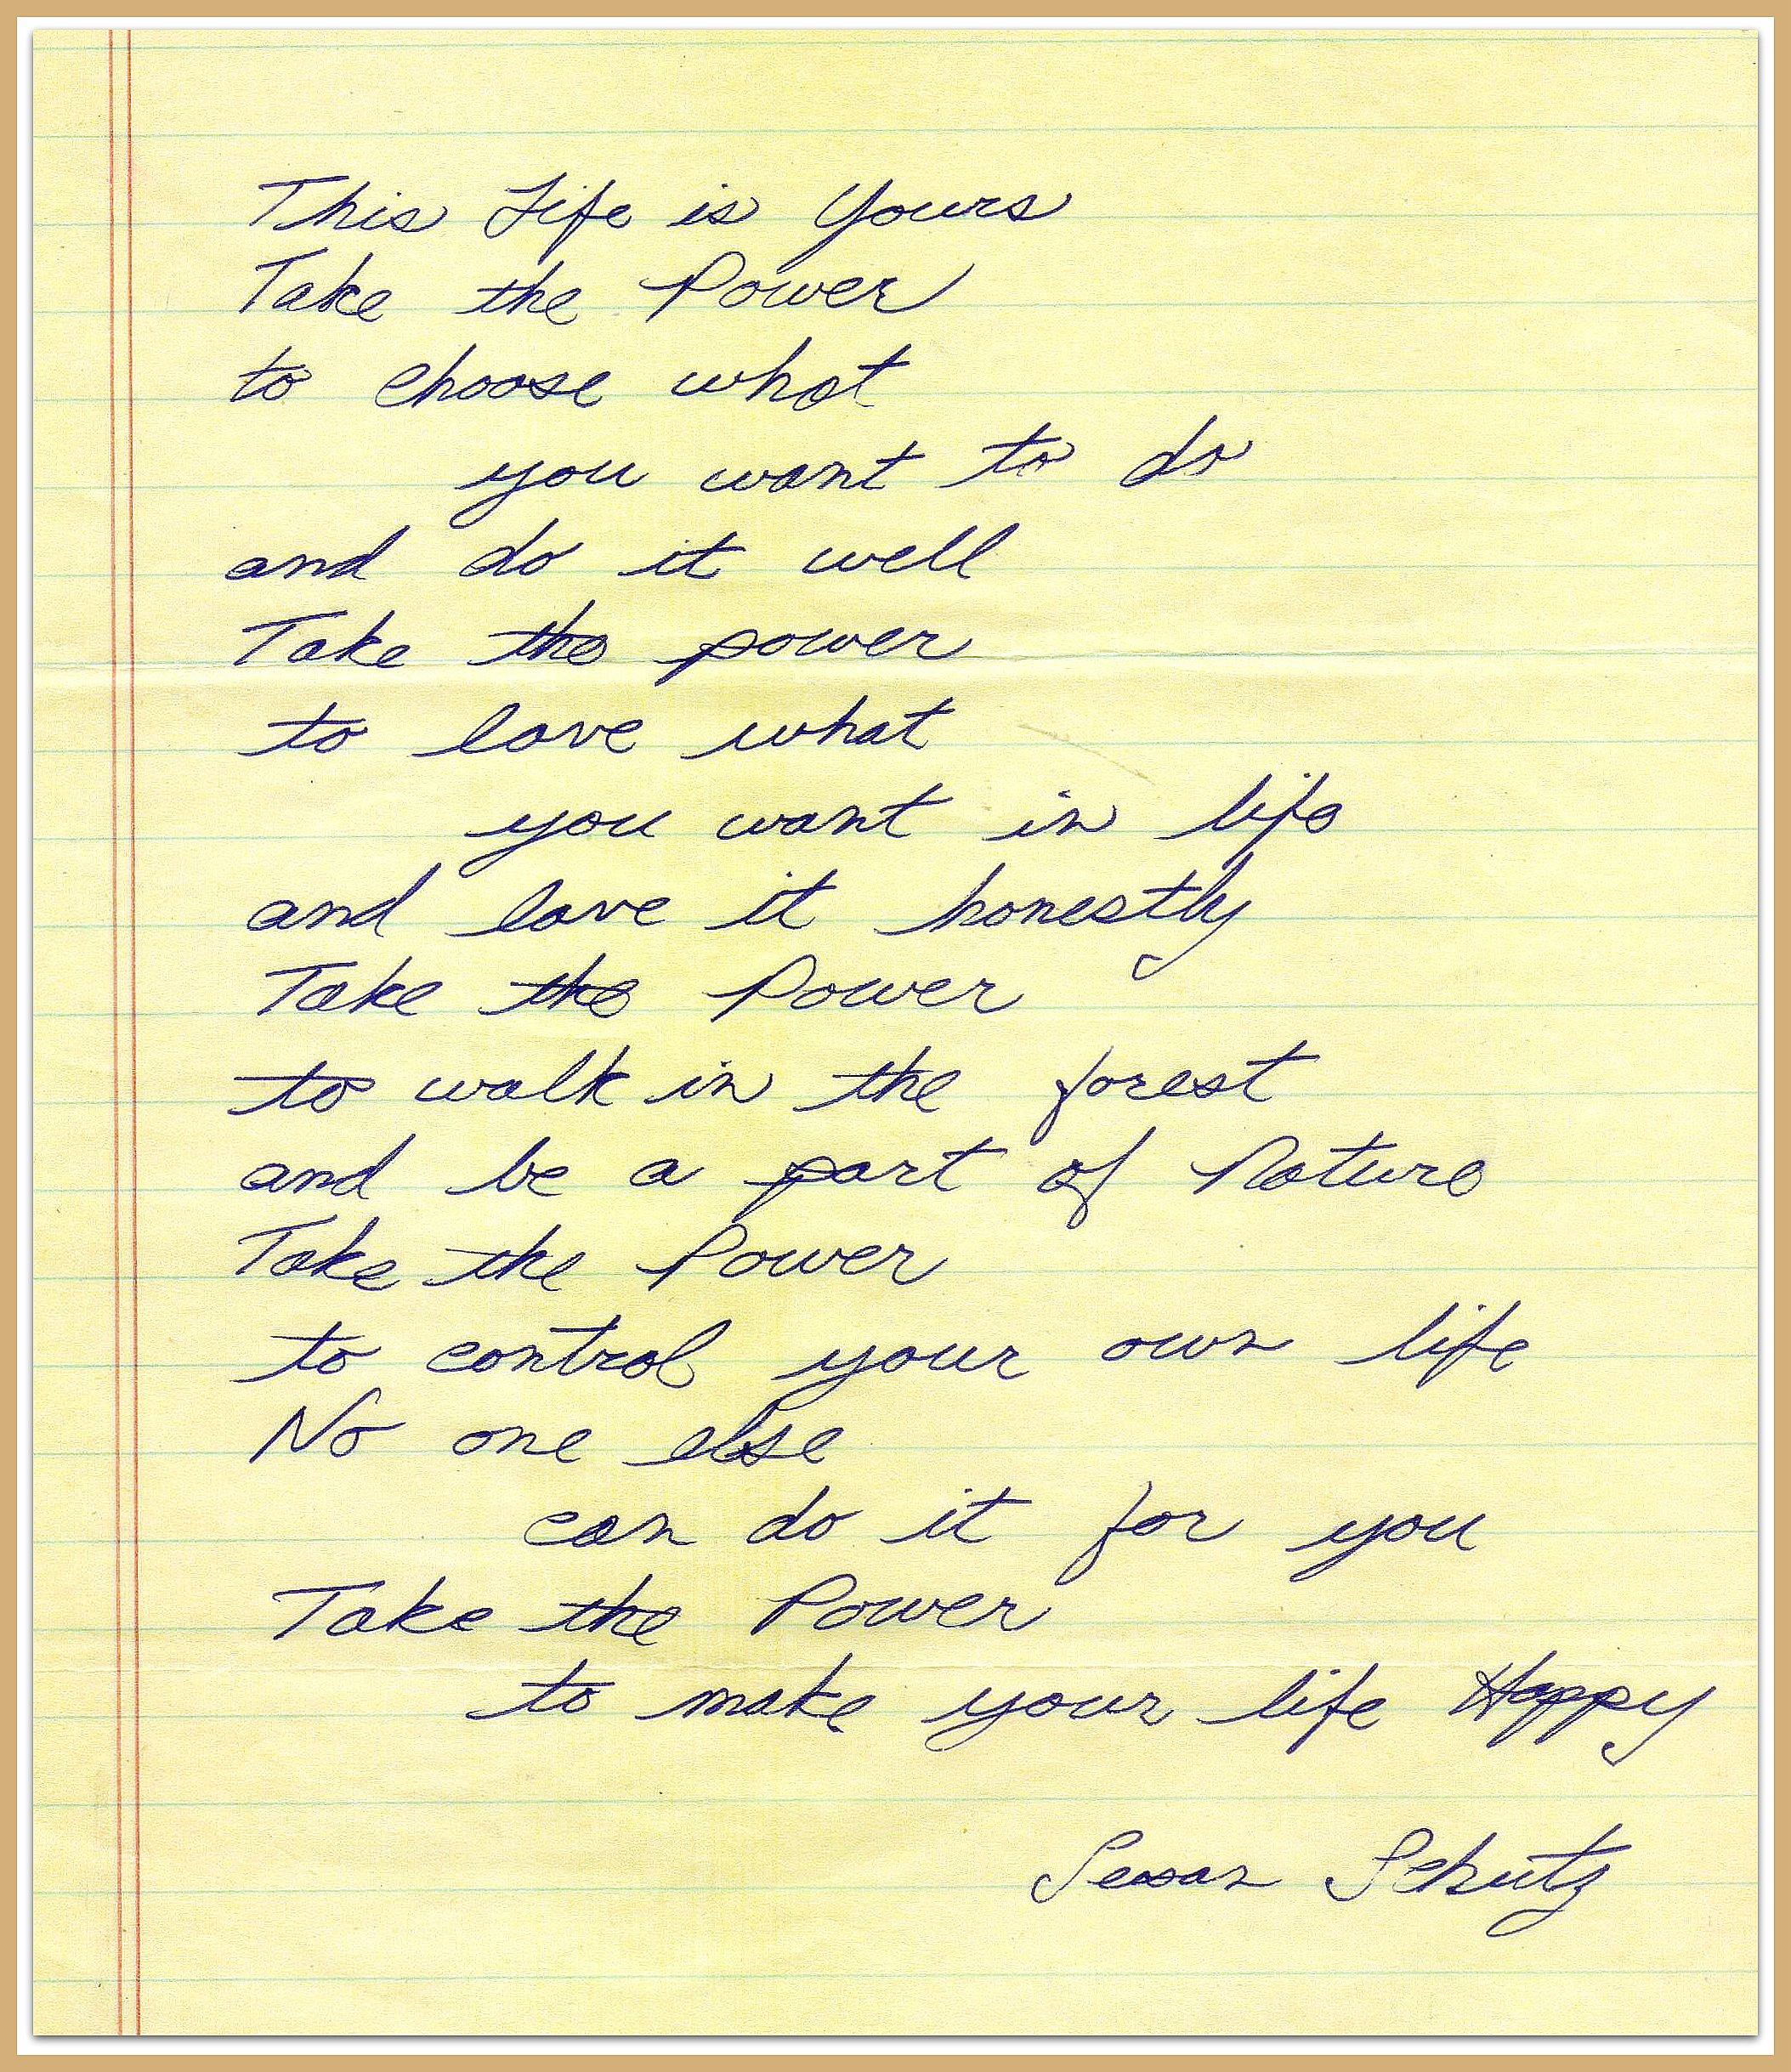 Poem Take the Power by Schultz framed